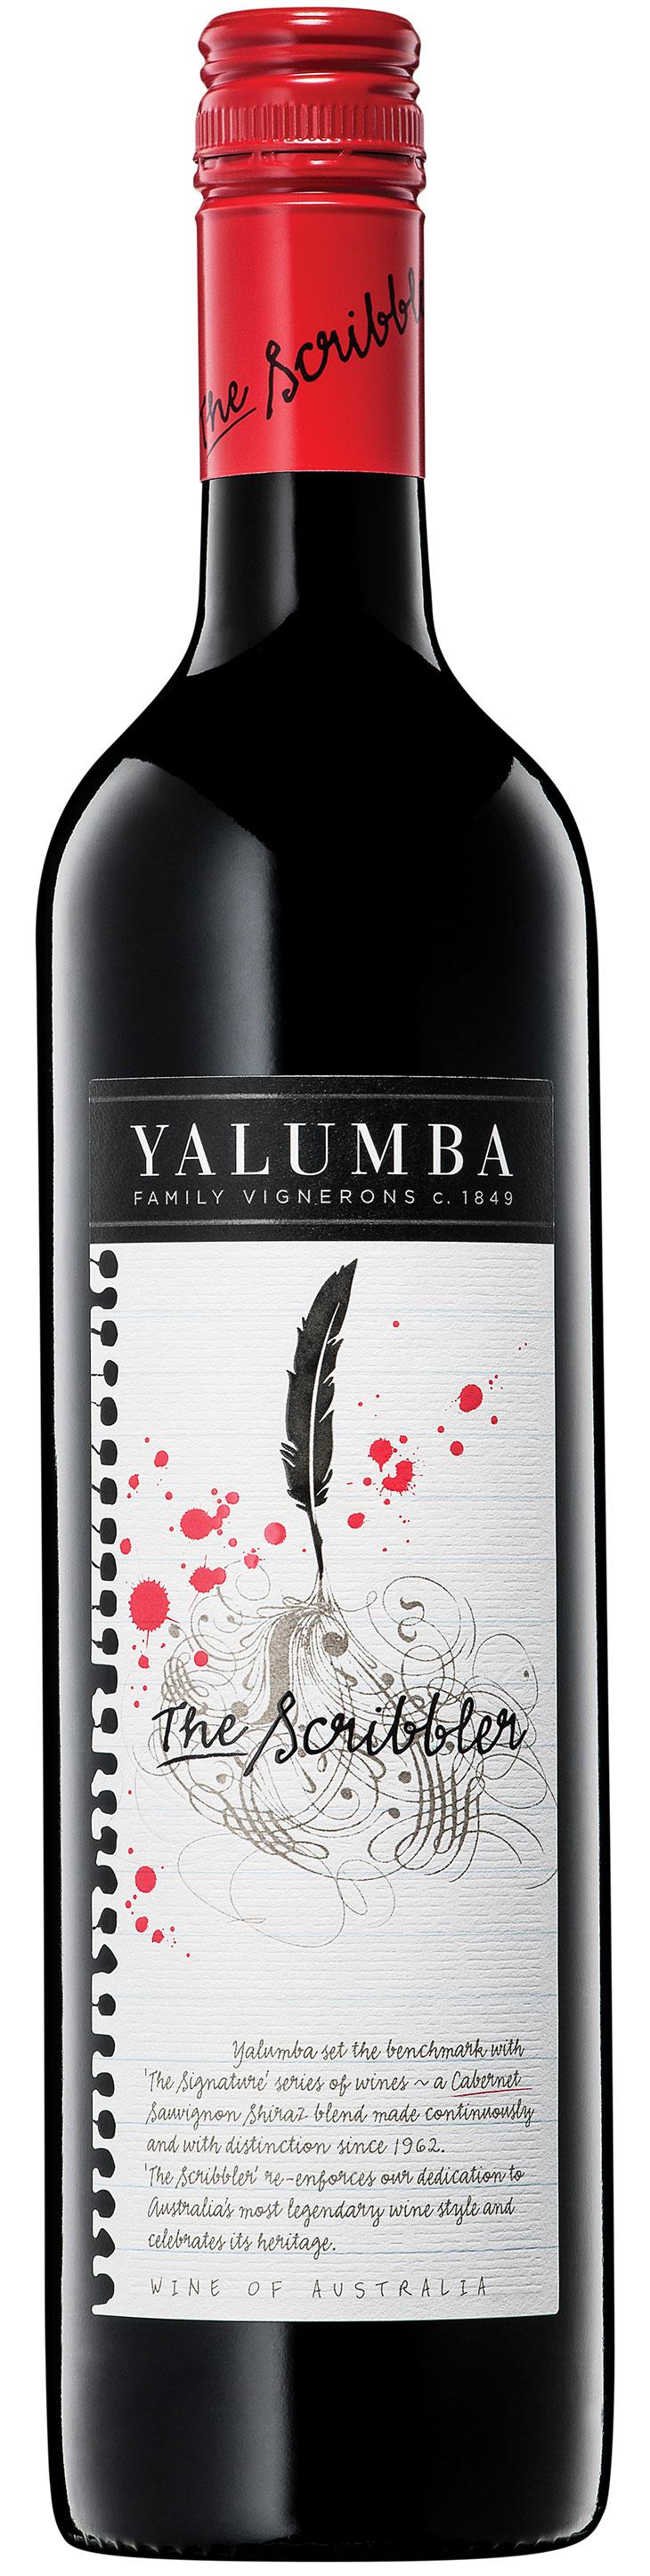 https://vinocorpperu.com/images/vinos/yalumba/the_scribbler_2015.jpg